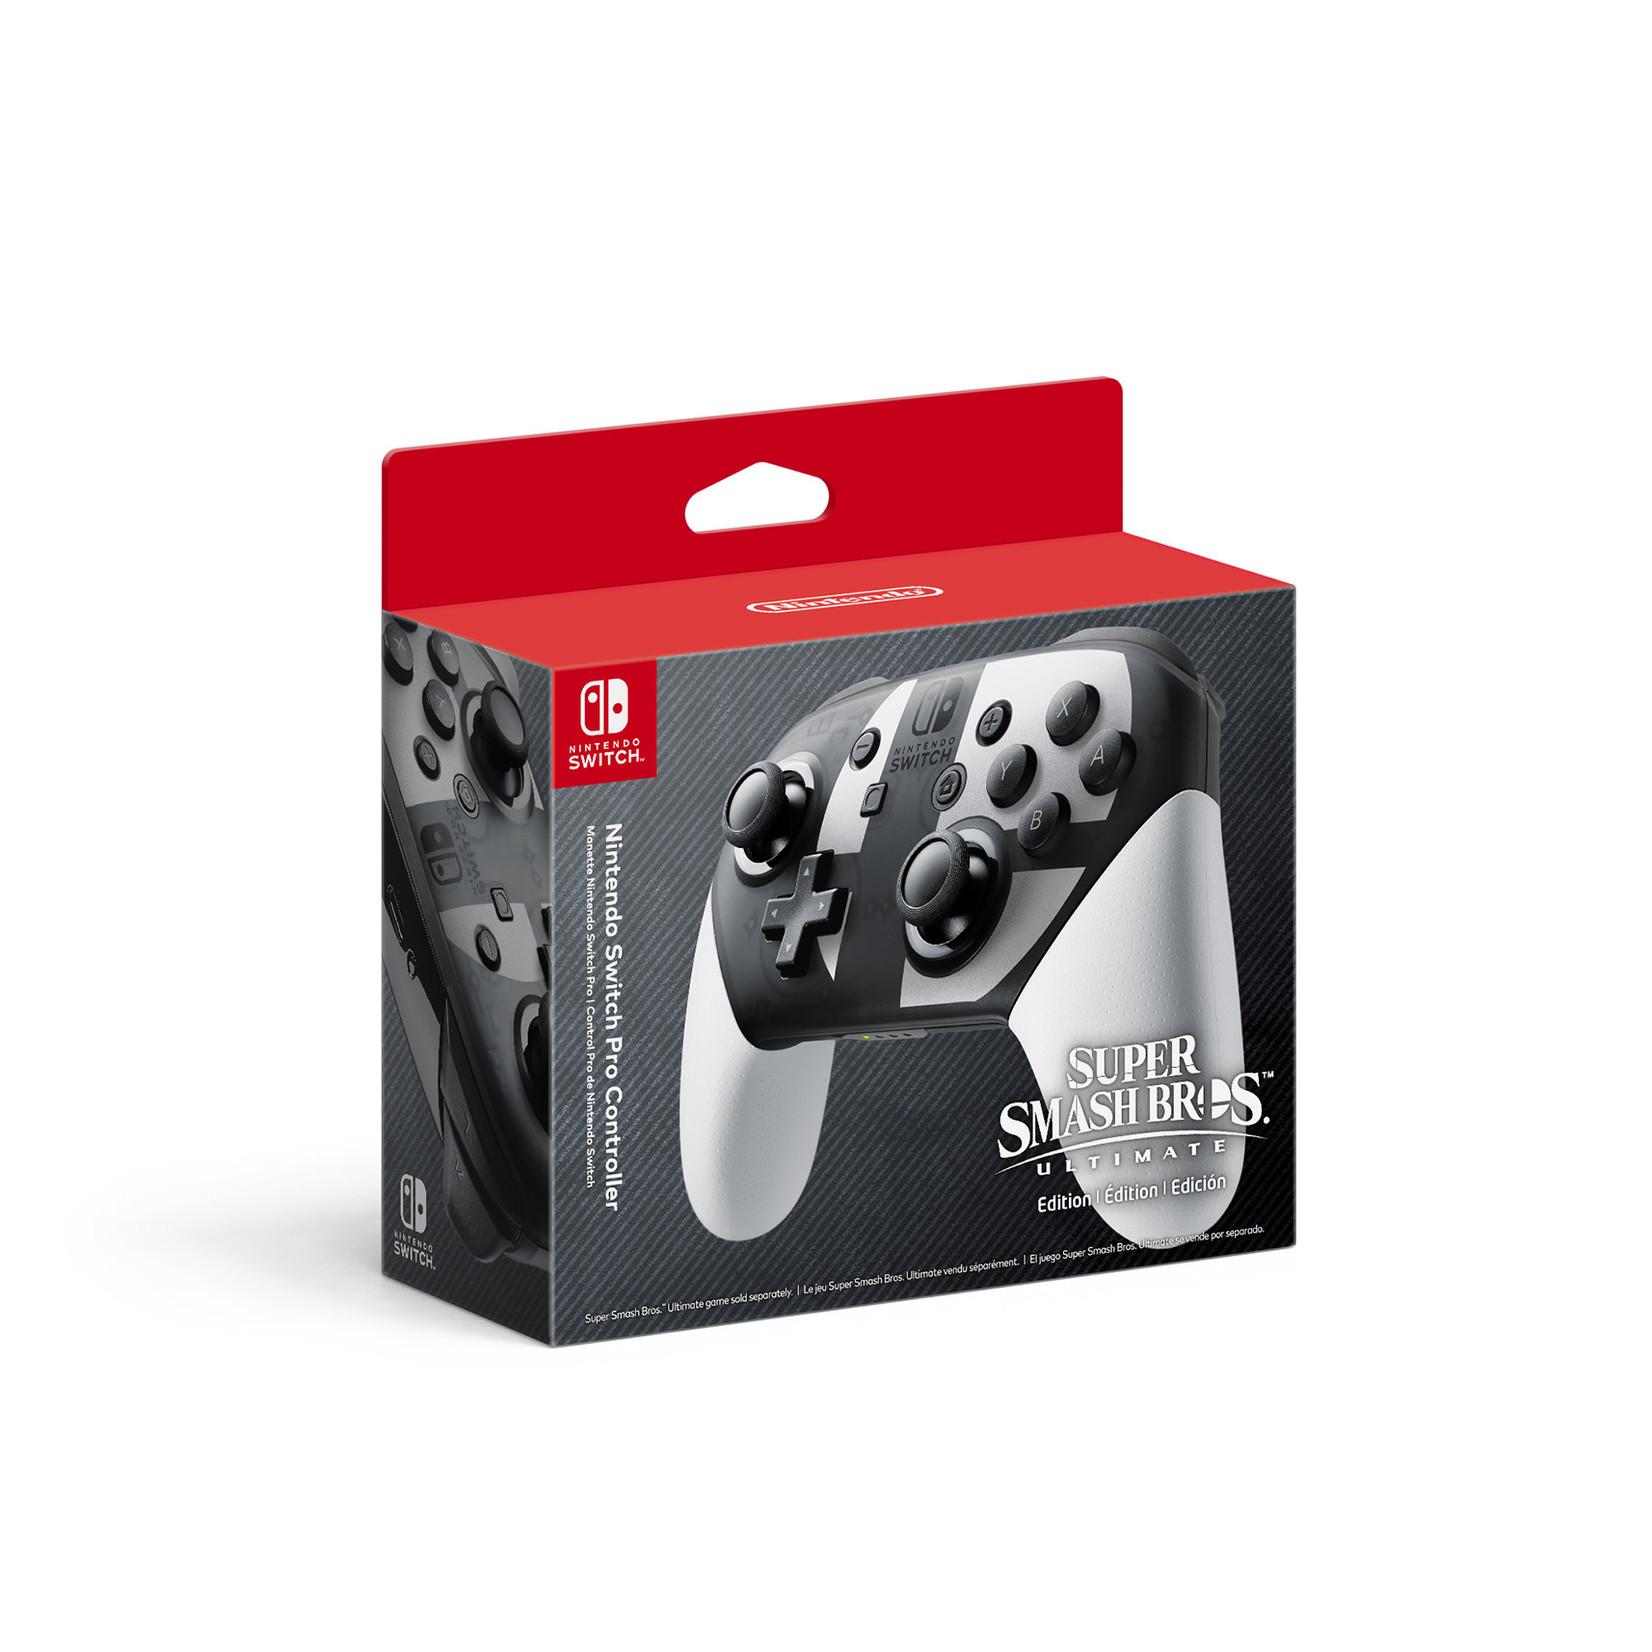 Nintendo Switch Pro Controller (Super Smash Bros)